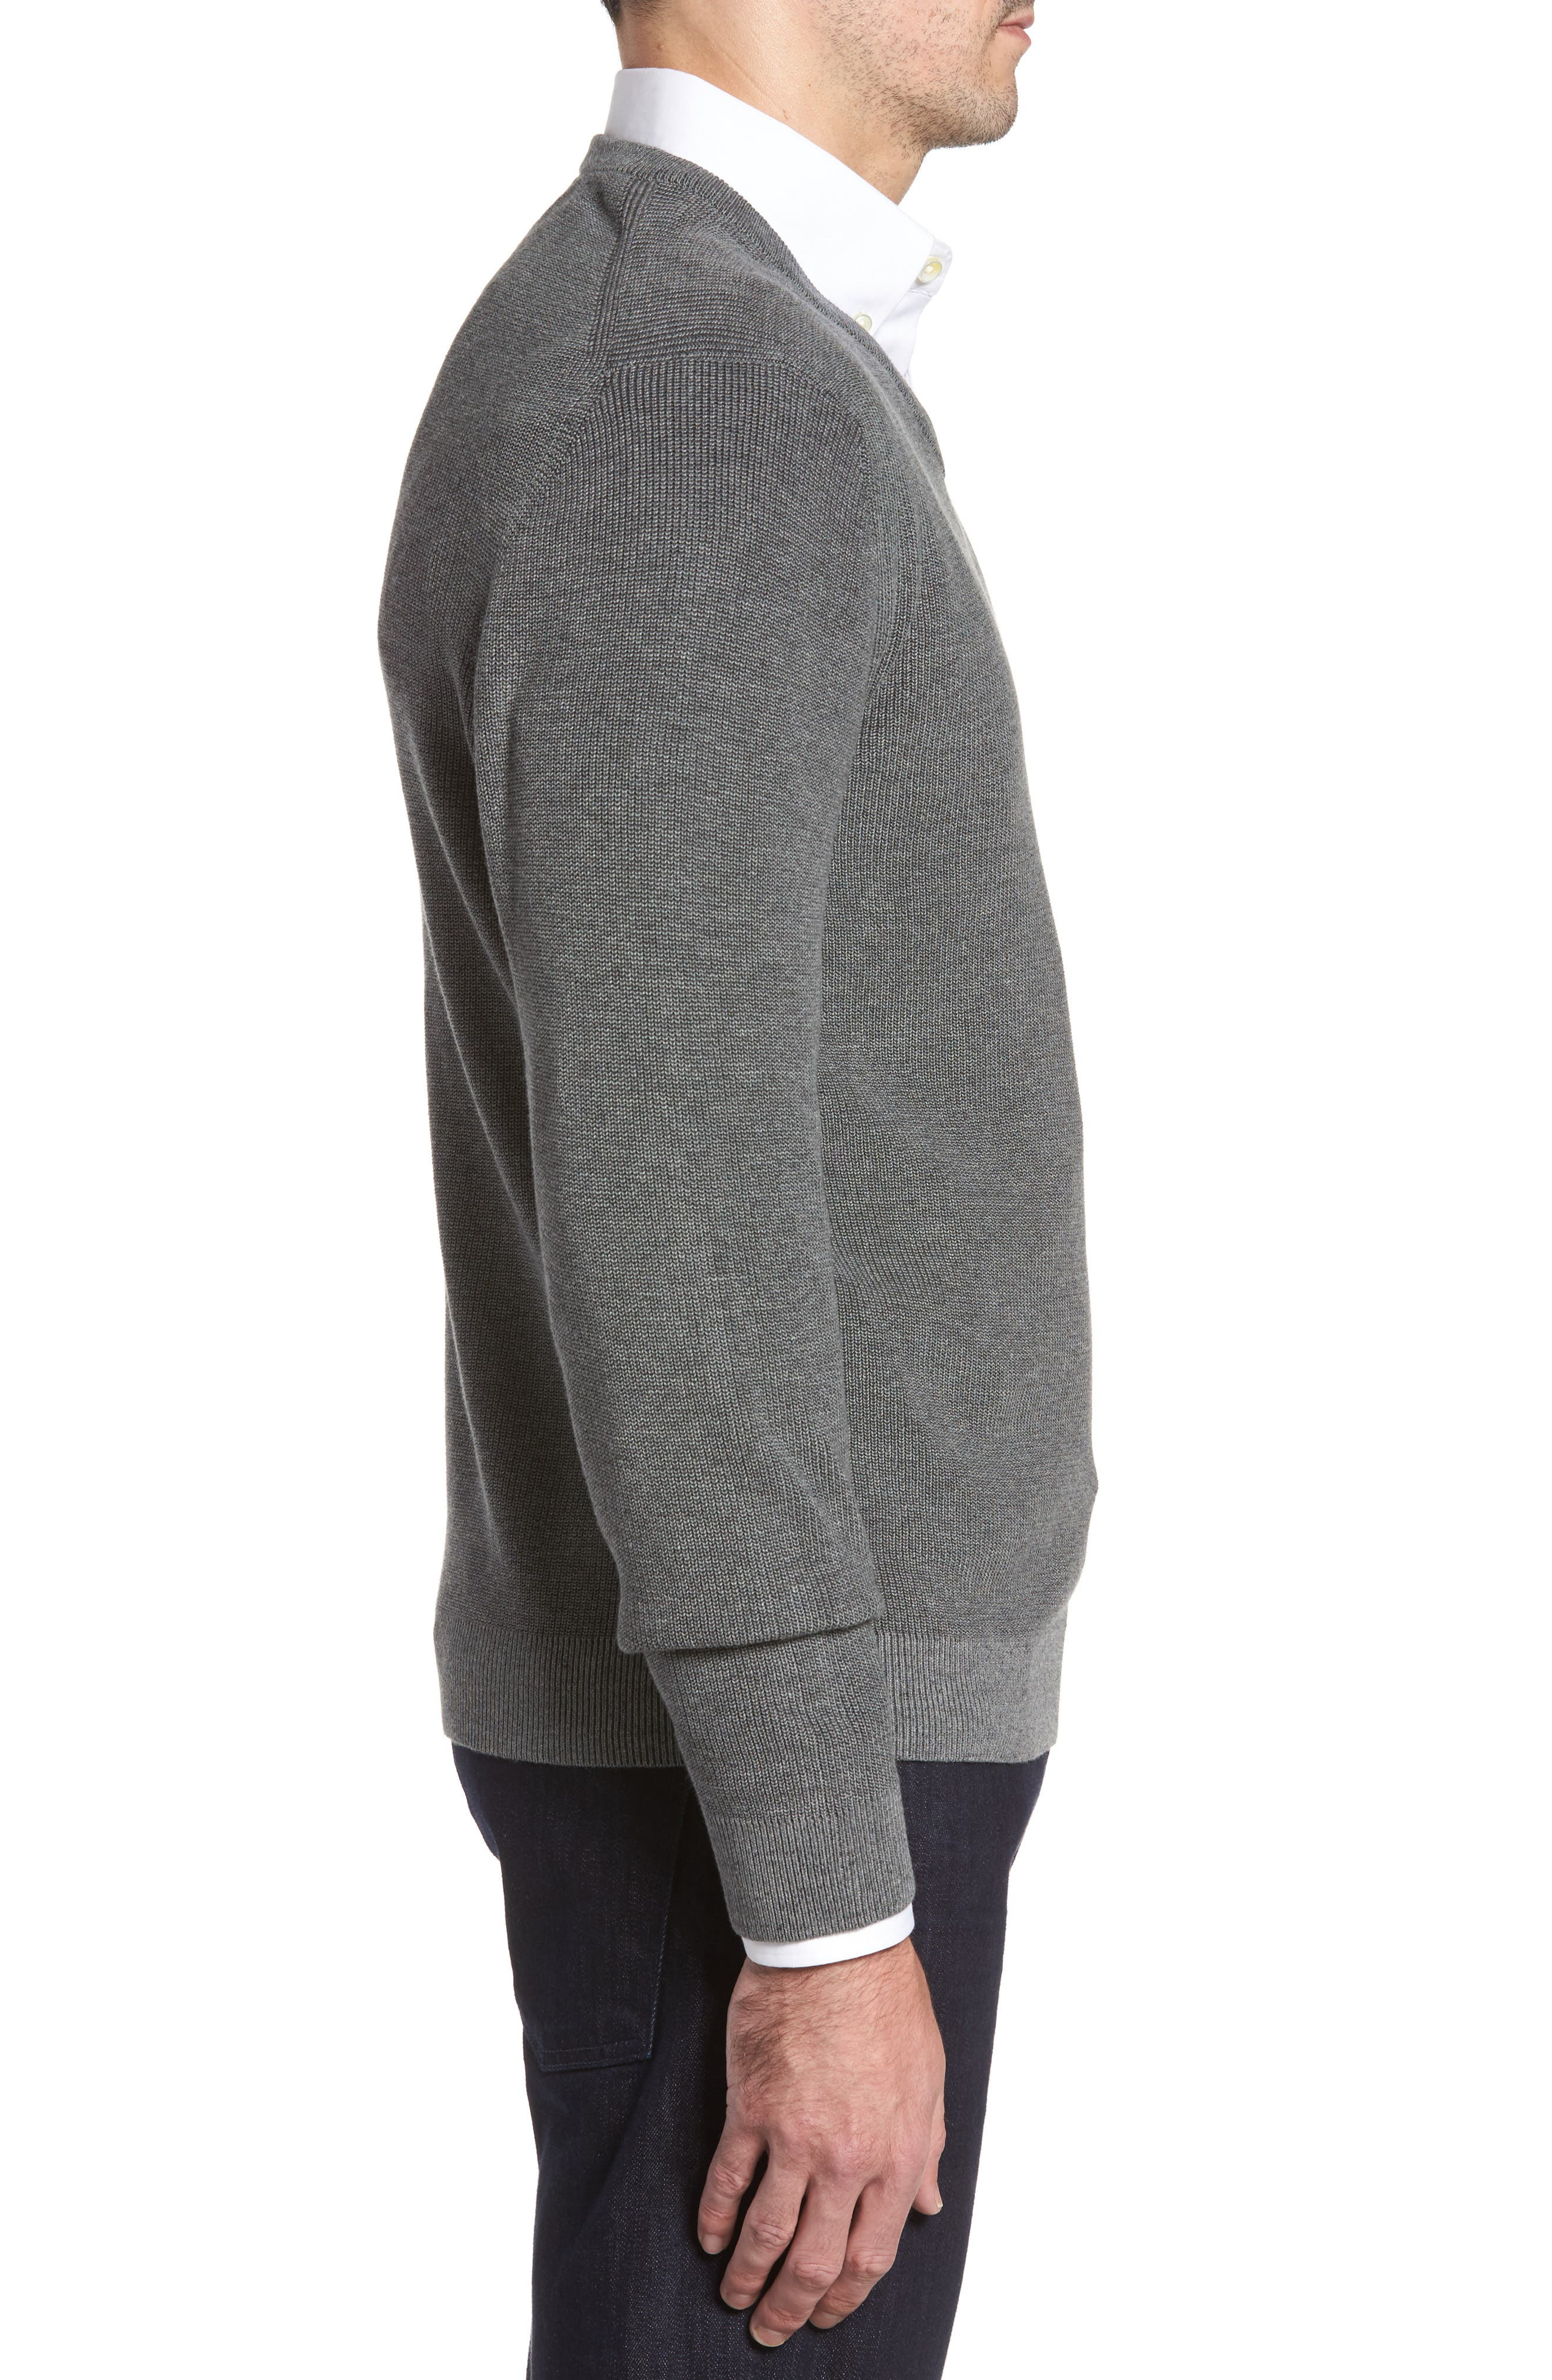 Las Palmas Reversible Sweater,                             Alternate thumbnail 3, color,                             Charcoal Heather